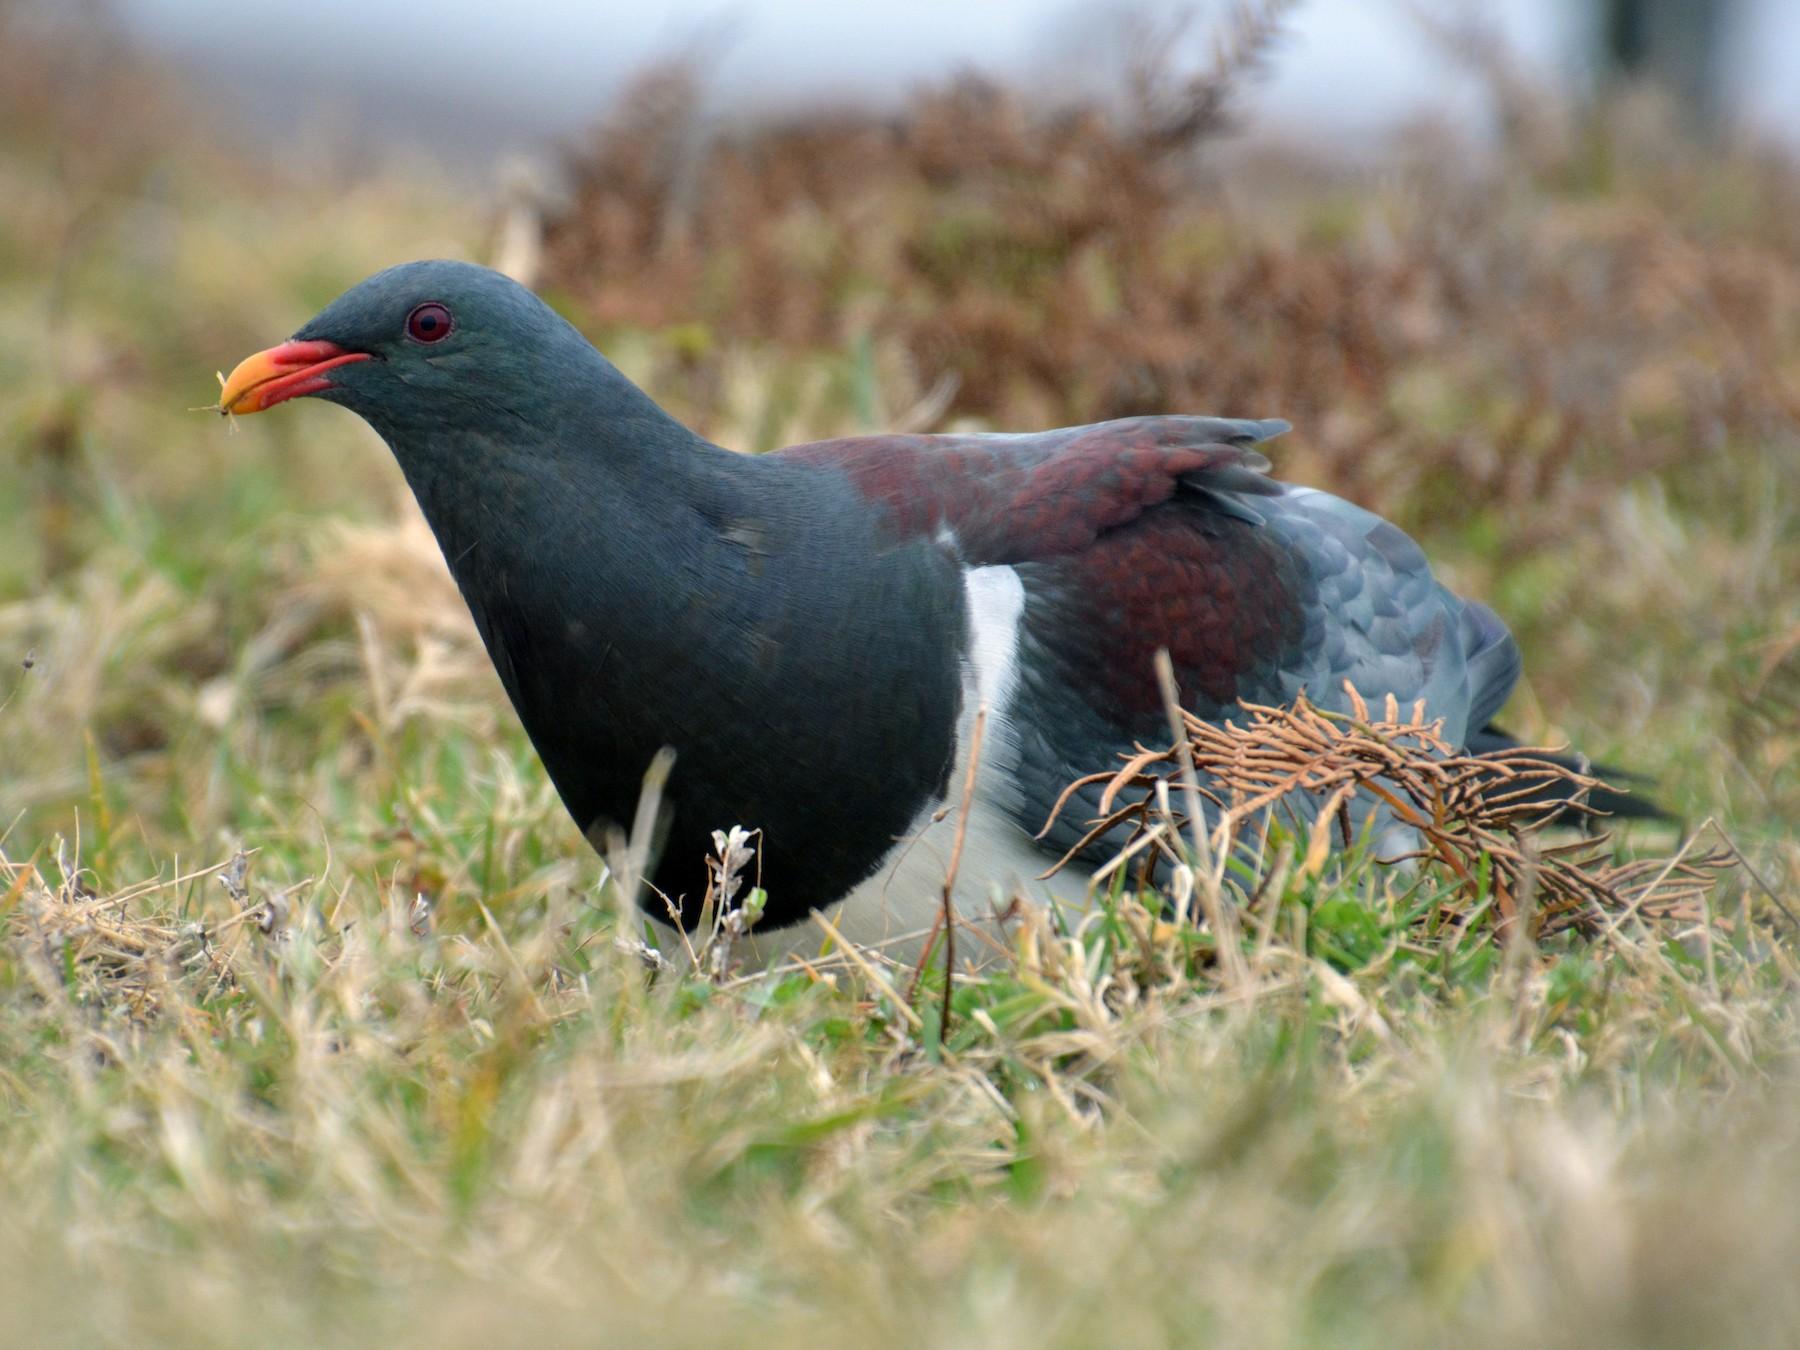 Chatham Island Pigeon - Oscar Thomas